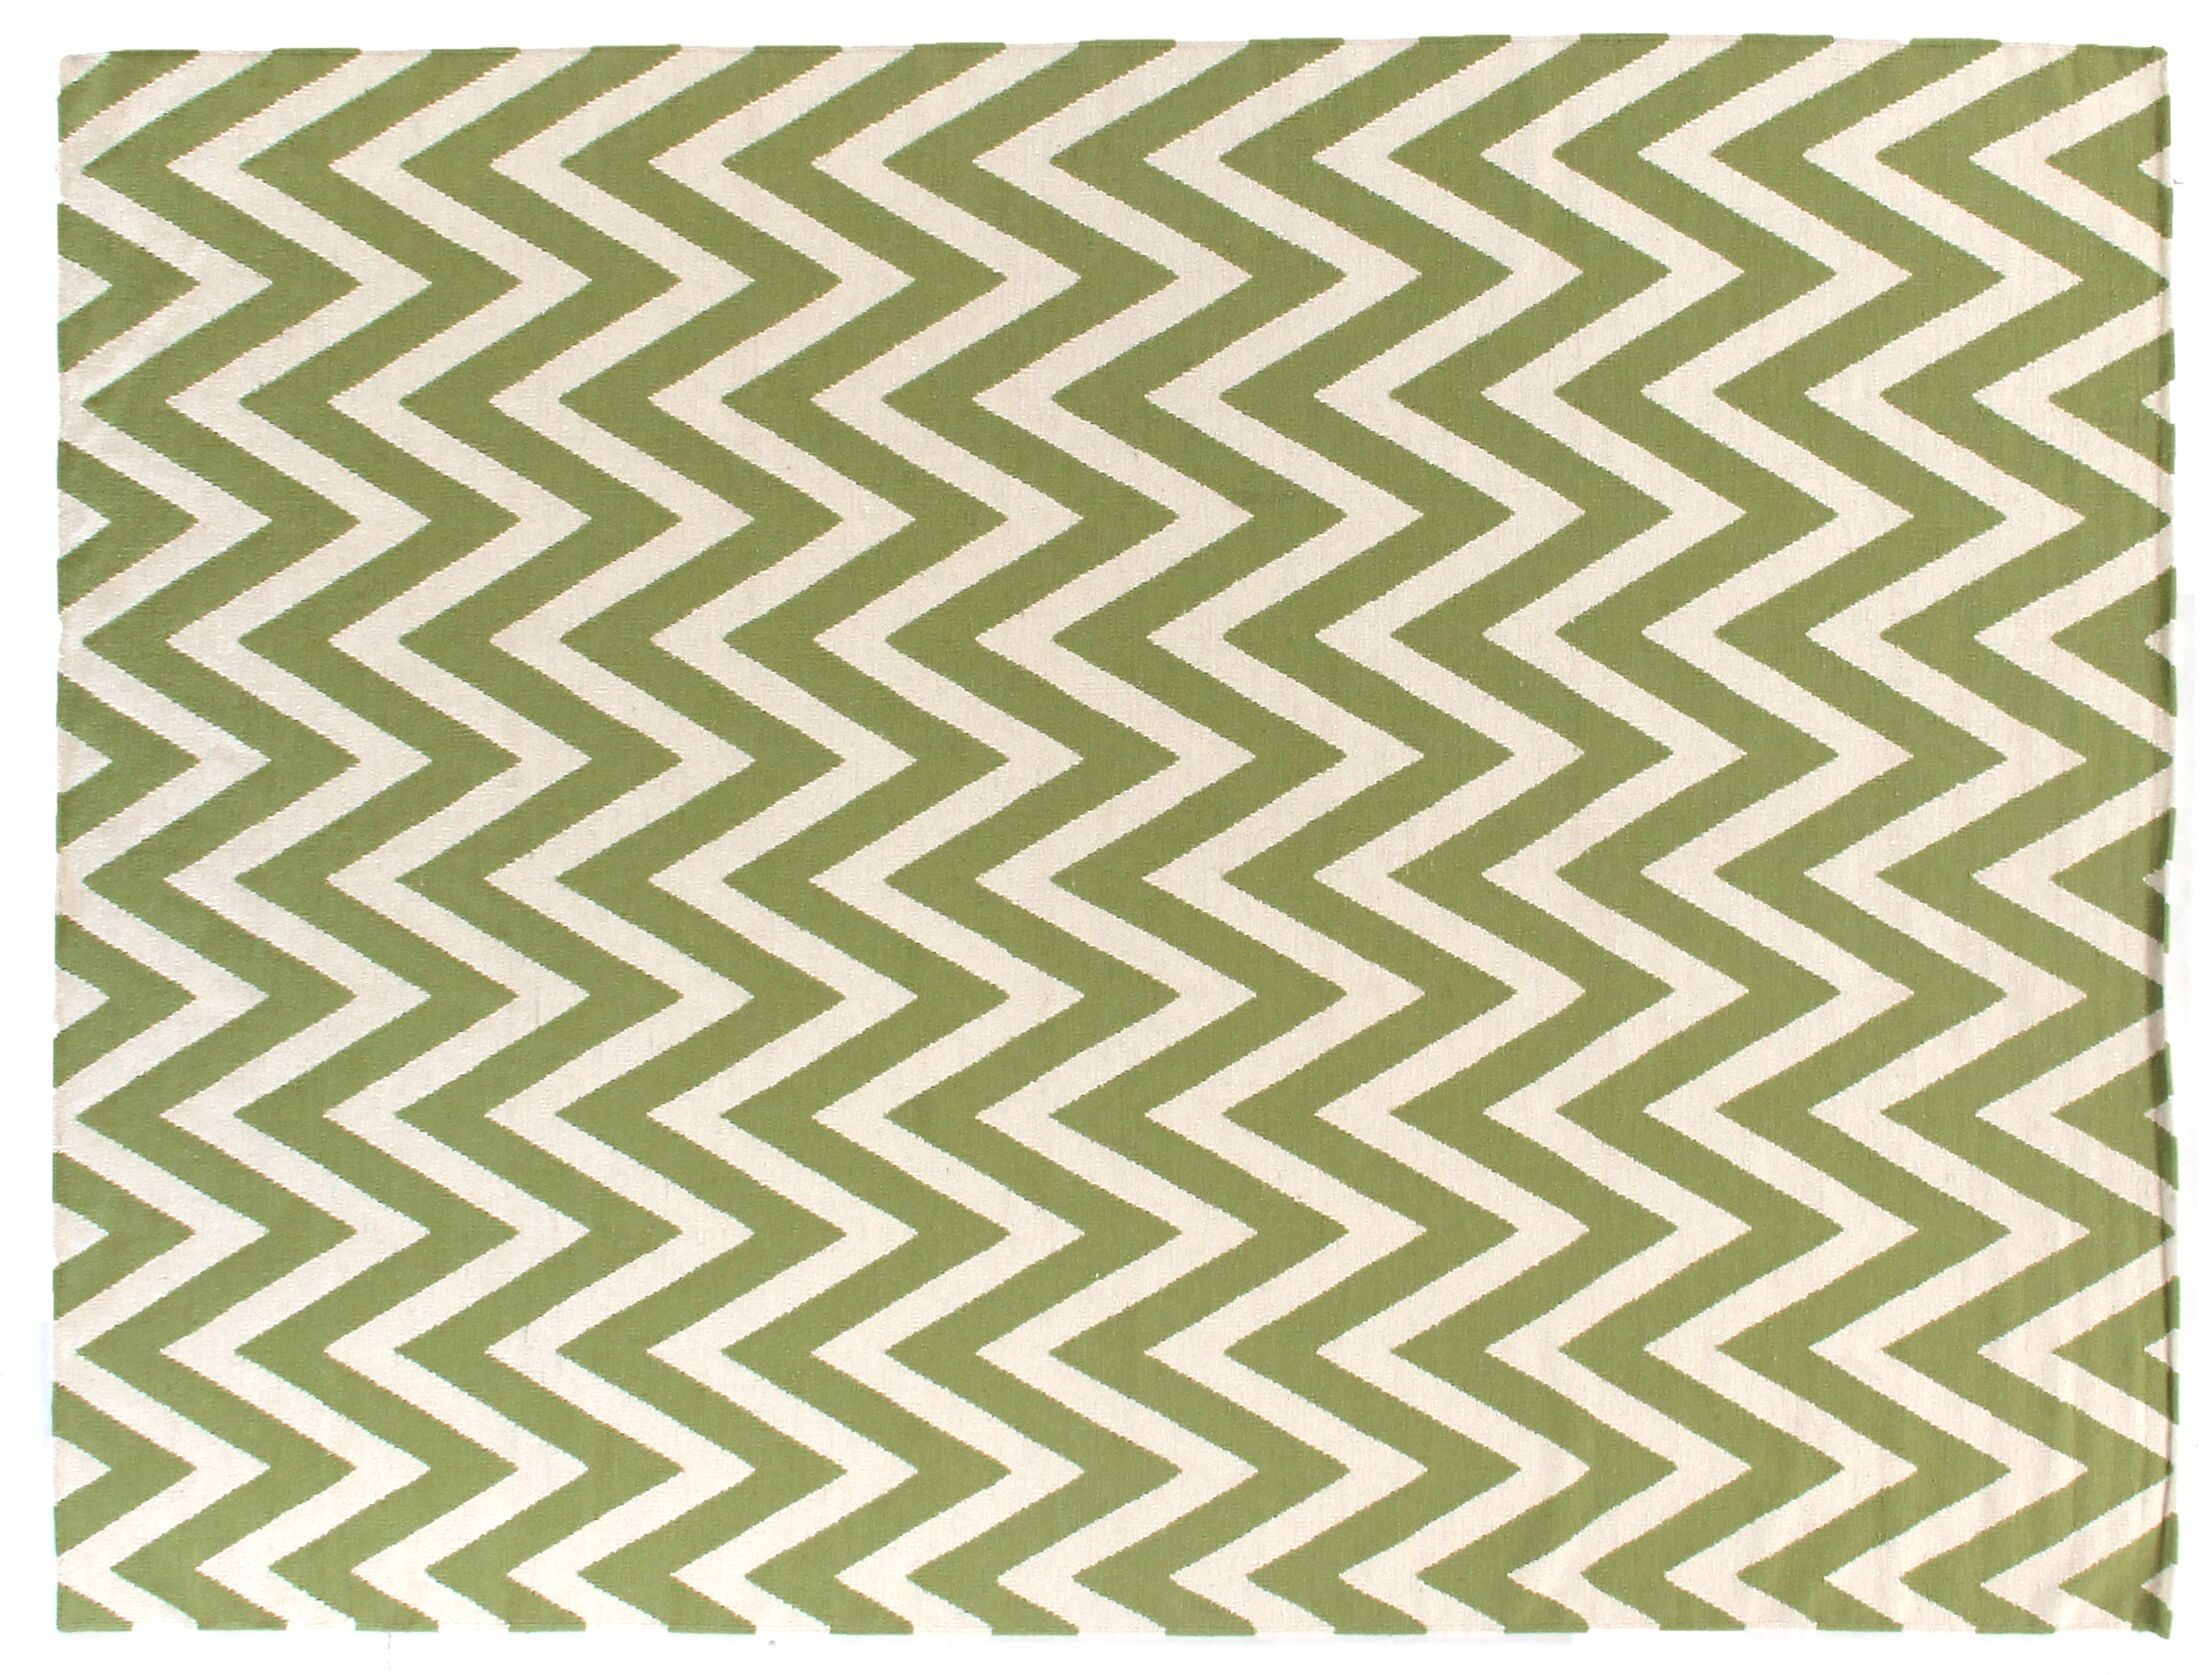 Hand-Woven Wool Light Green/Cream Area Rug Rug Size: Rectangle 9'6